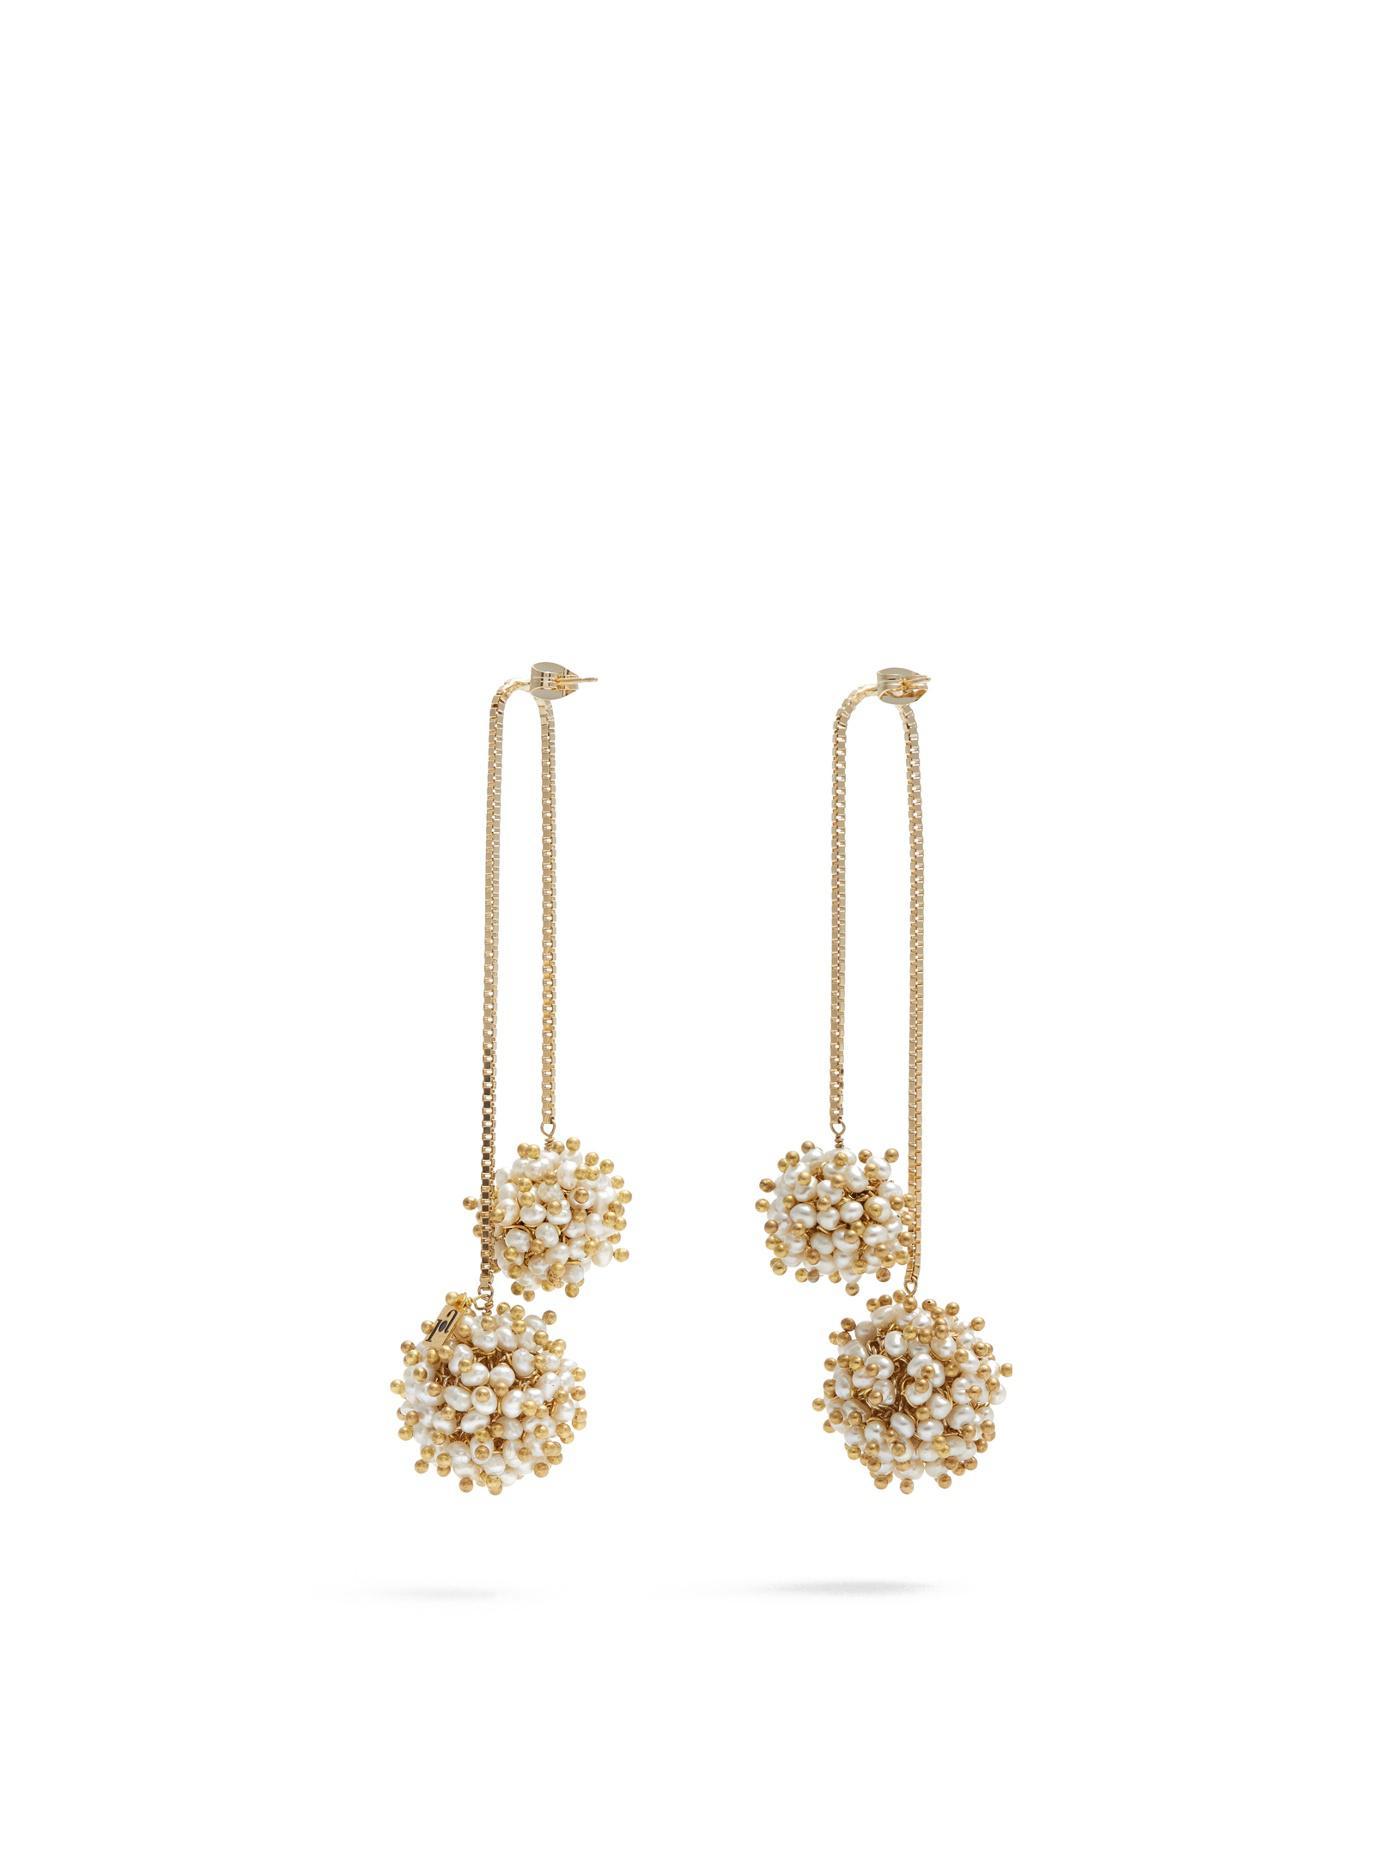 Nicekicks Cheapest For Sale Suono drop earrings Rosantica Where To Buy Cheap Real UJTX7yTOd